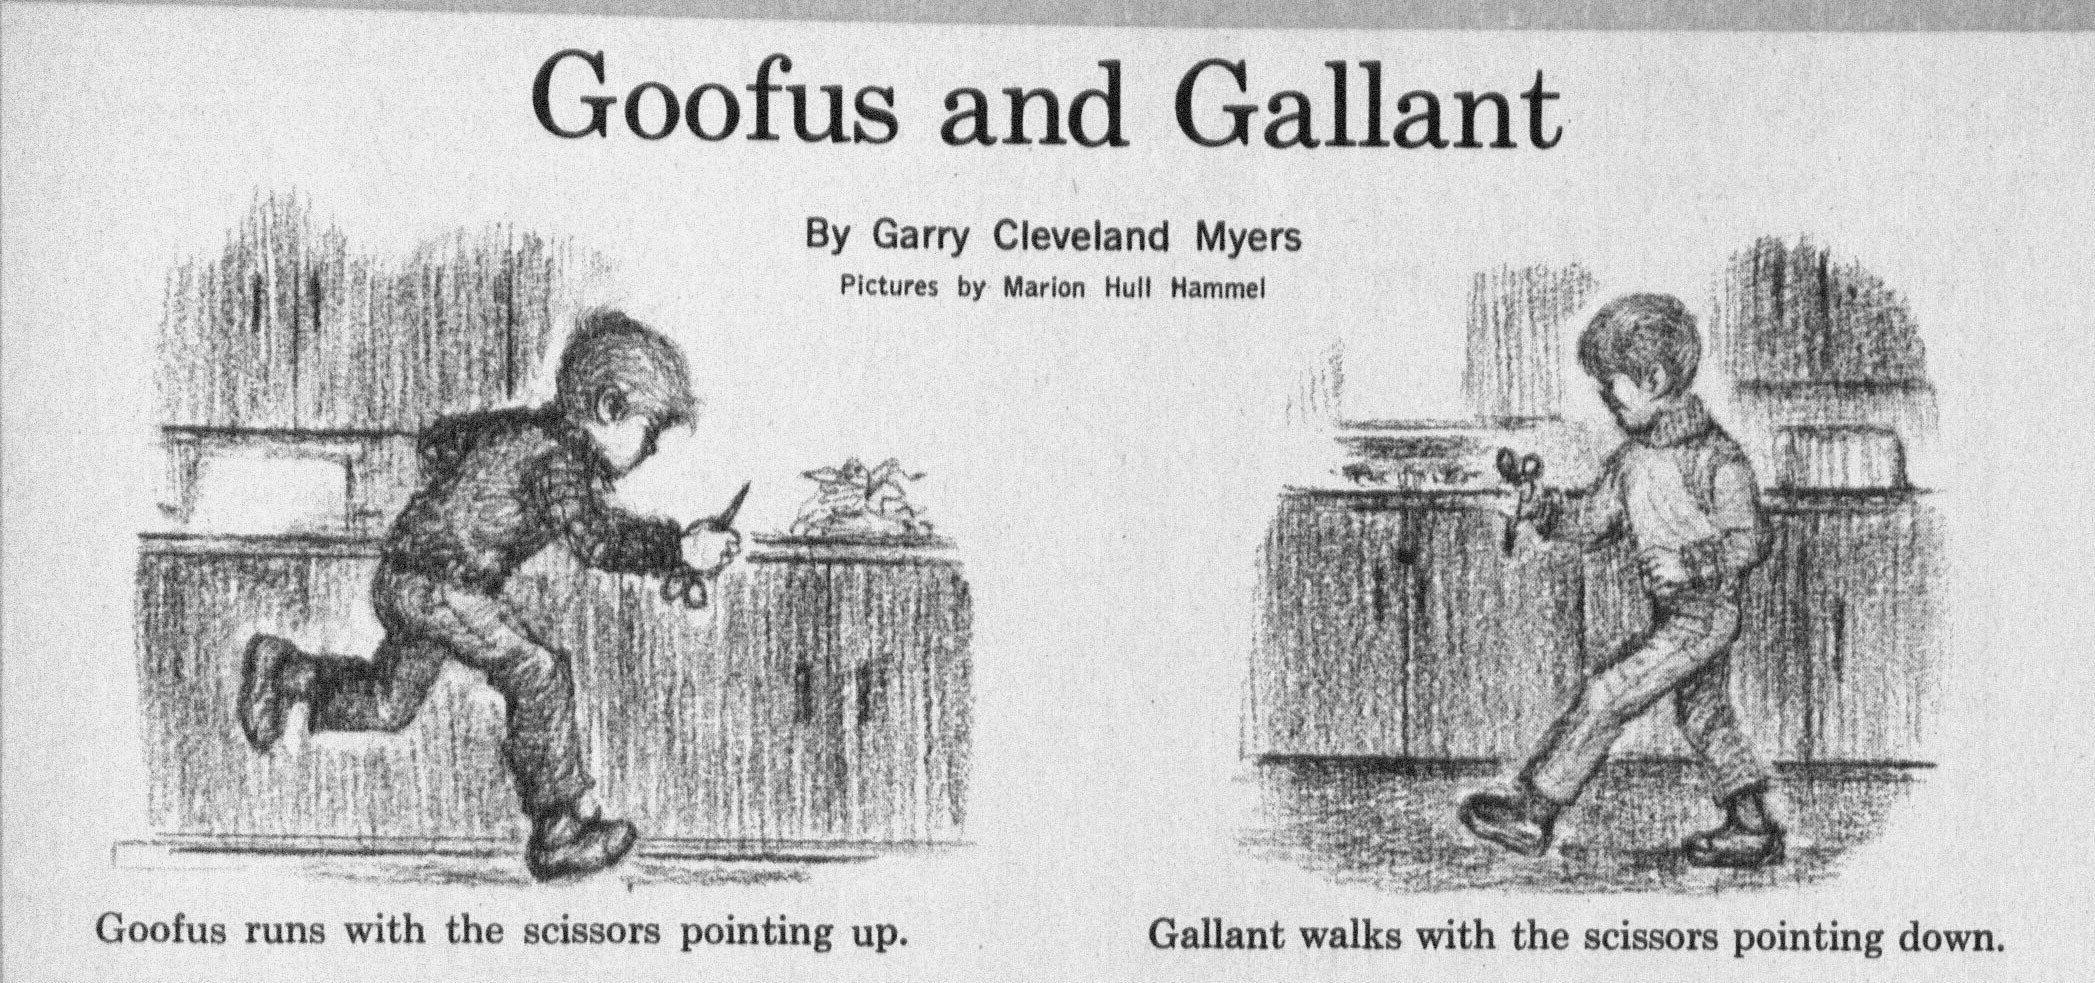 e36dd639636ed6325d62b5671389a0e8 goofus and gallant a tale of two protagonists highlights magazine